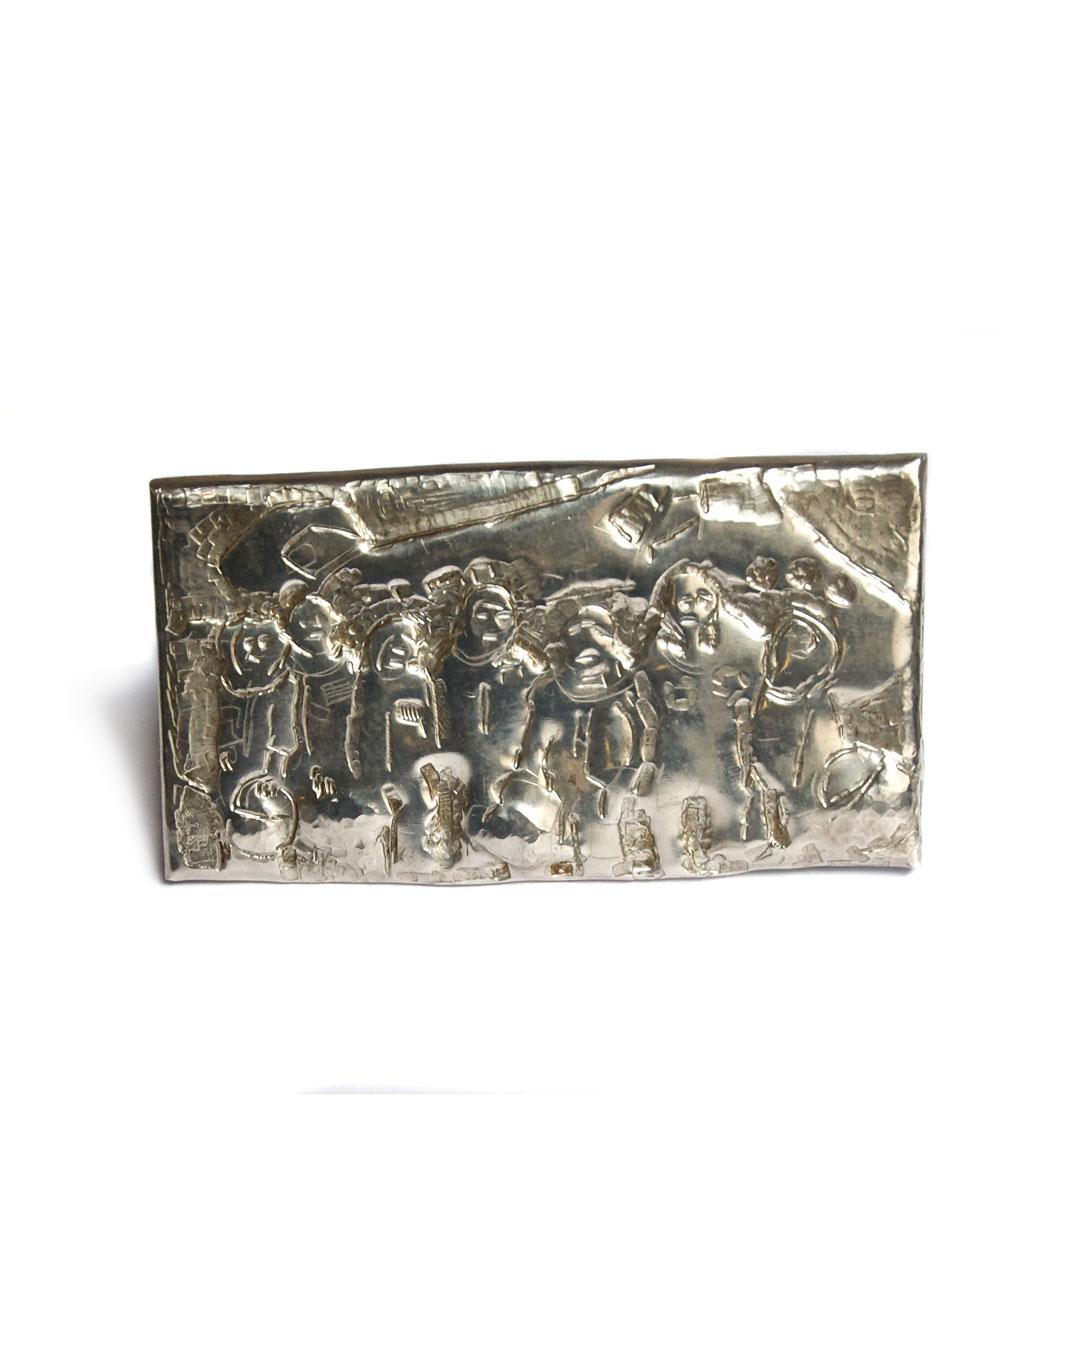 Rudolf Kocéa, Astronauten (Astronauts), 2007, brooch; silver, 55 x 105 x 5 mm, €1535